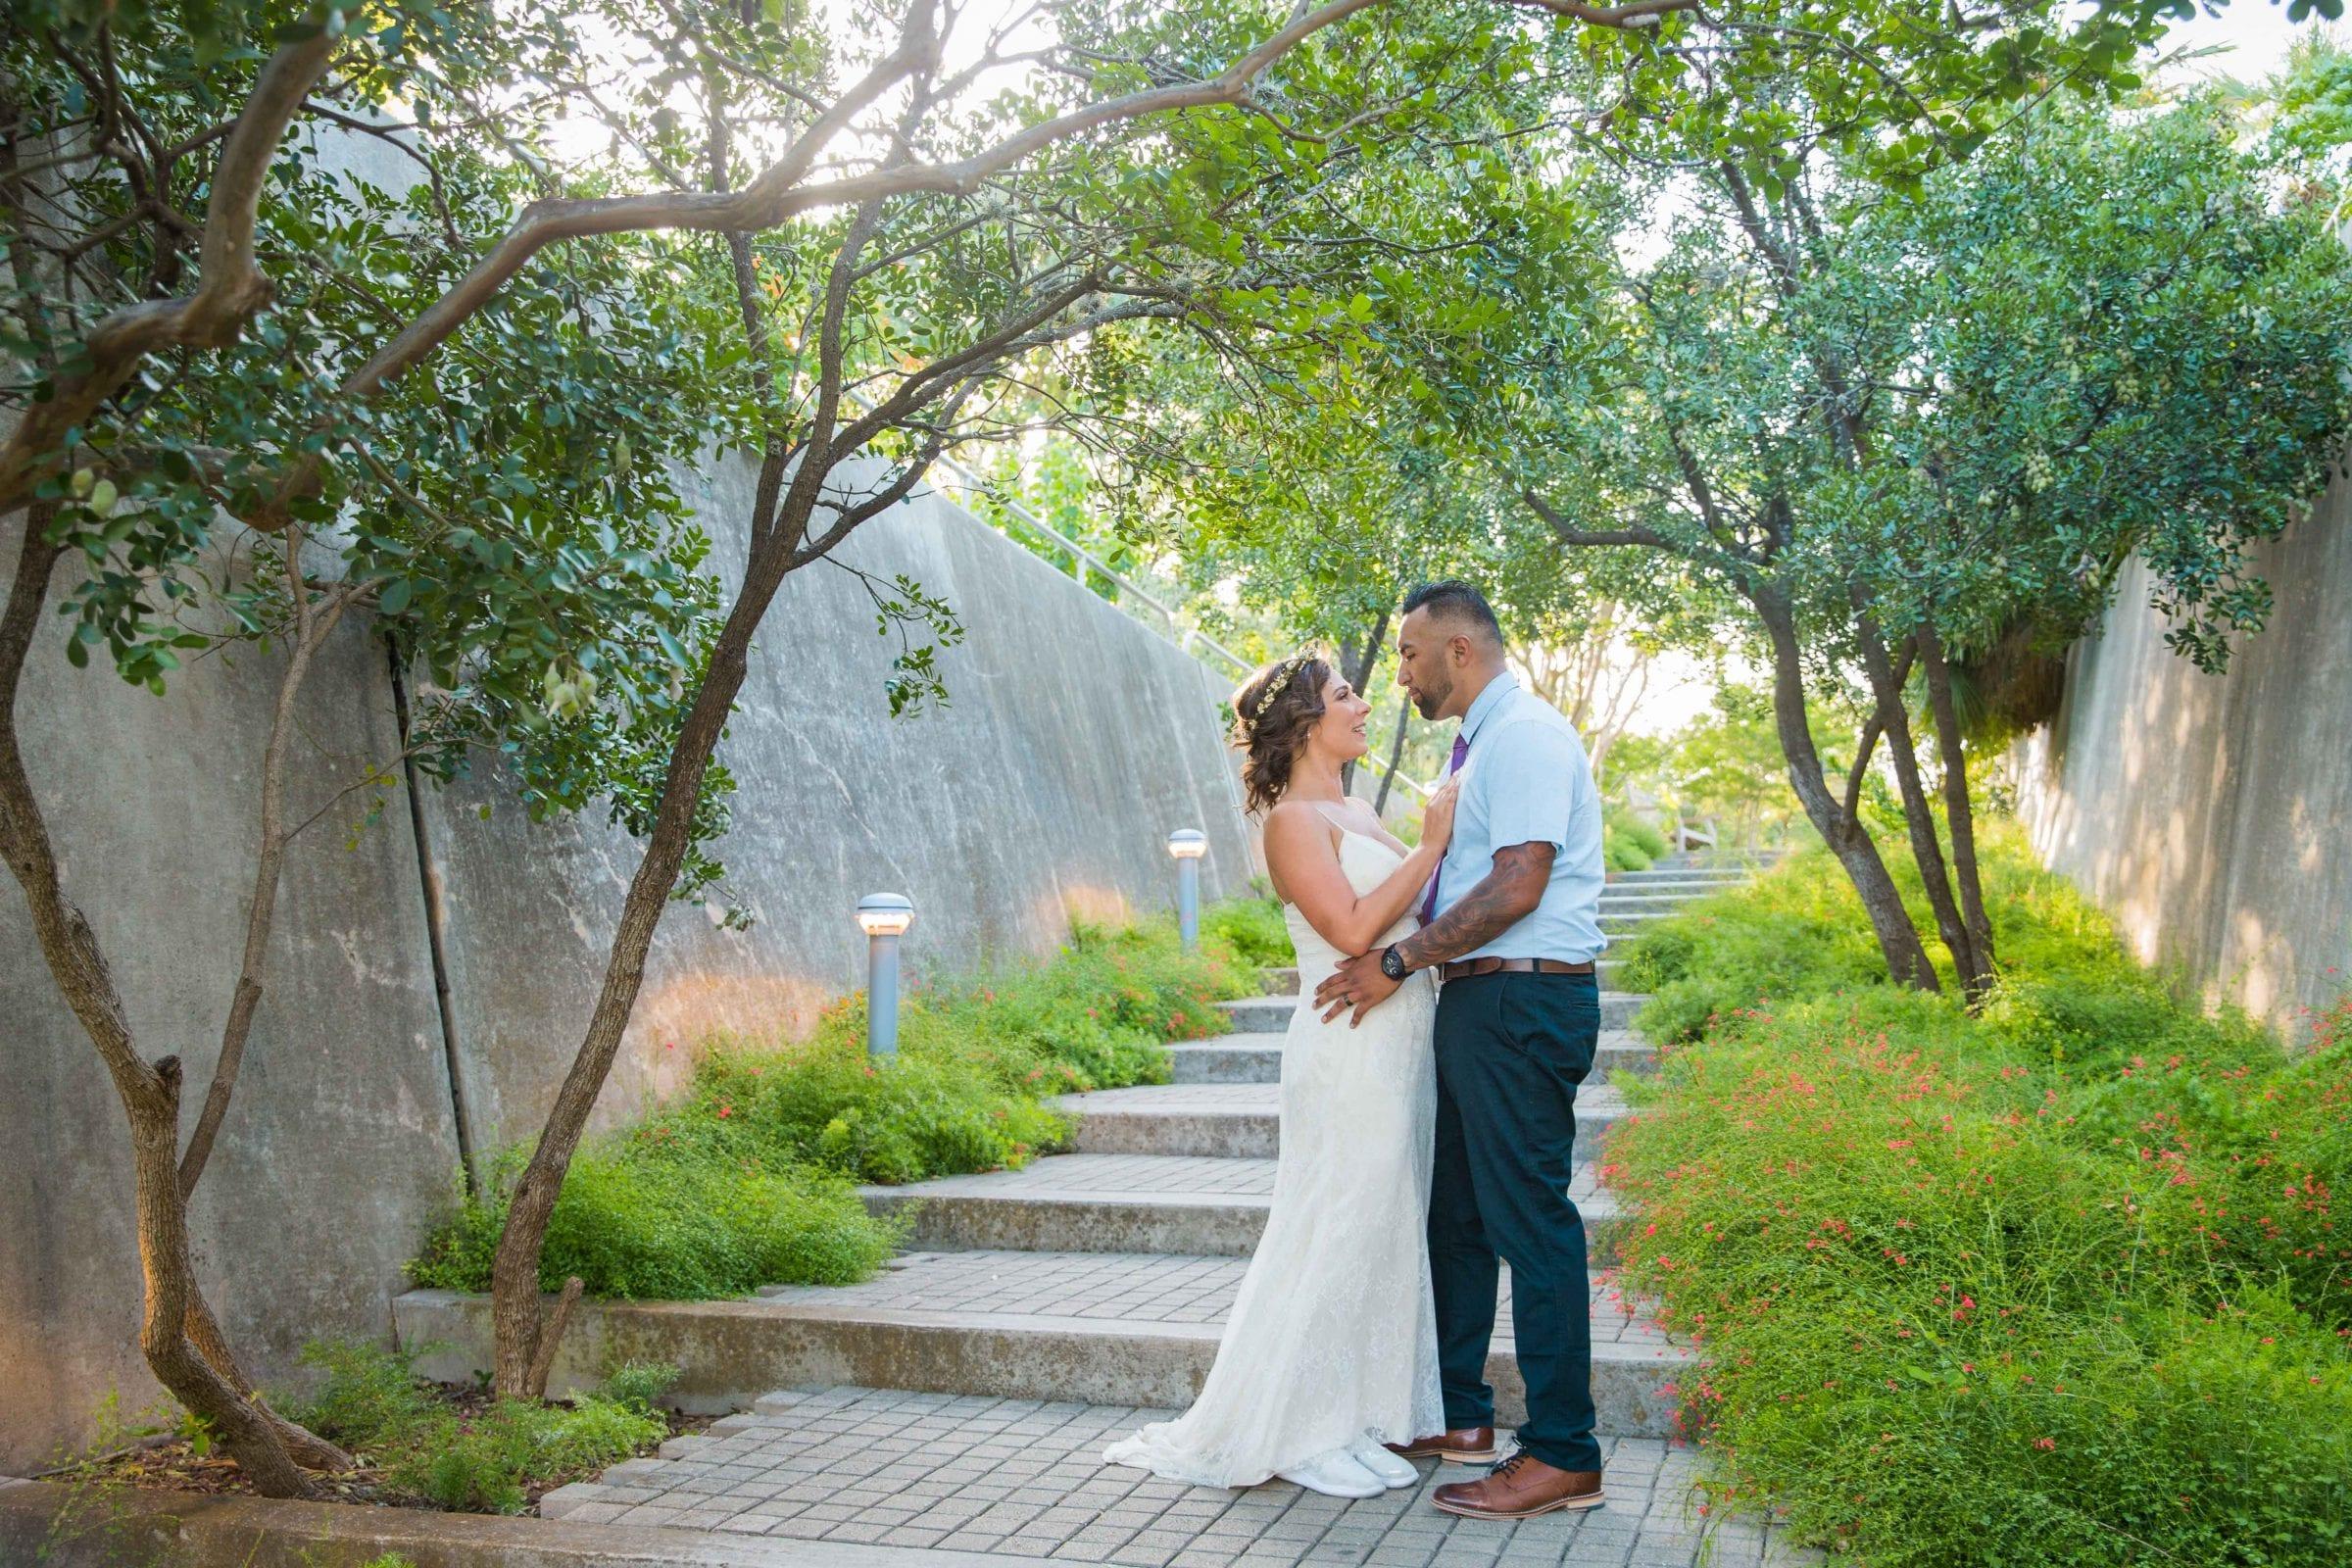 Courtney Amaya wedding San Antonio Botanical Garden couple on the stairs